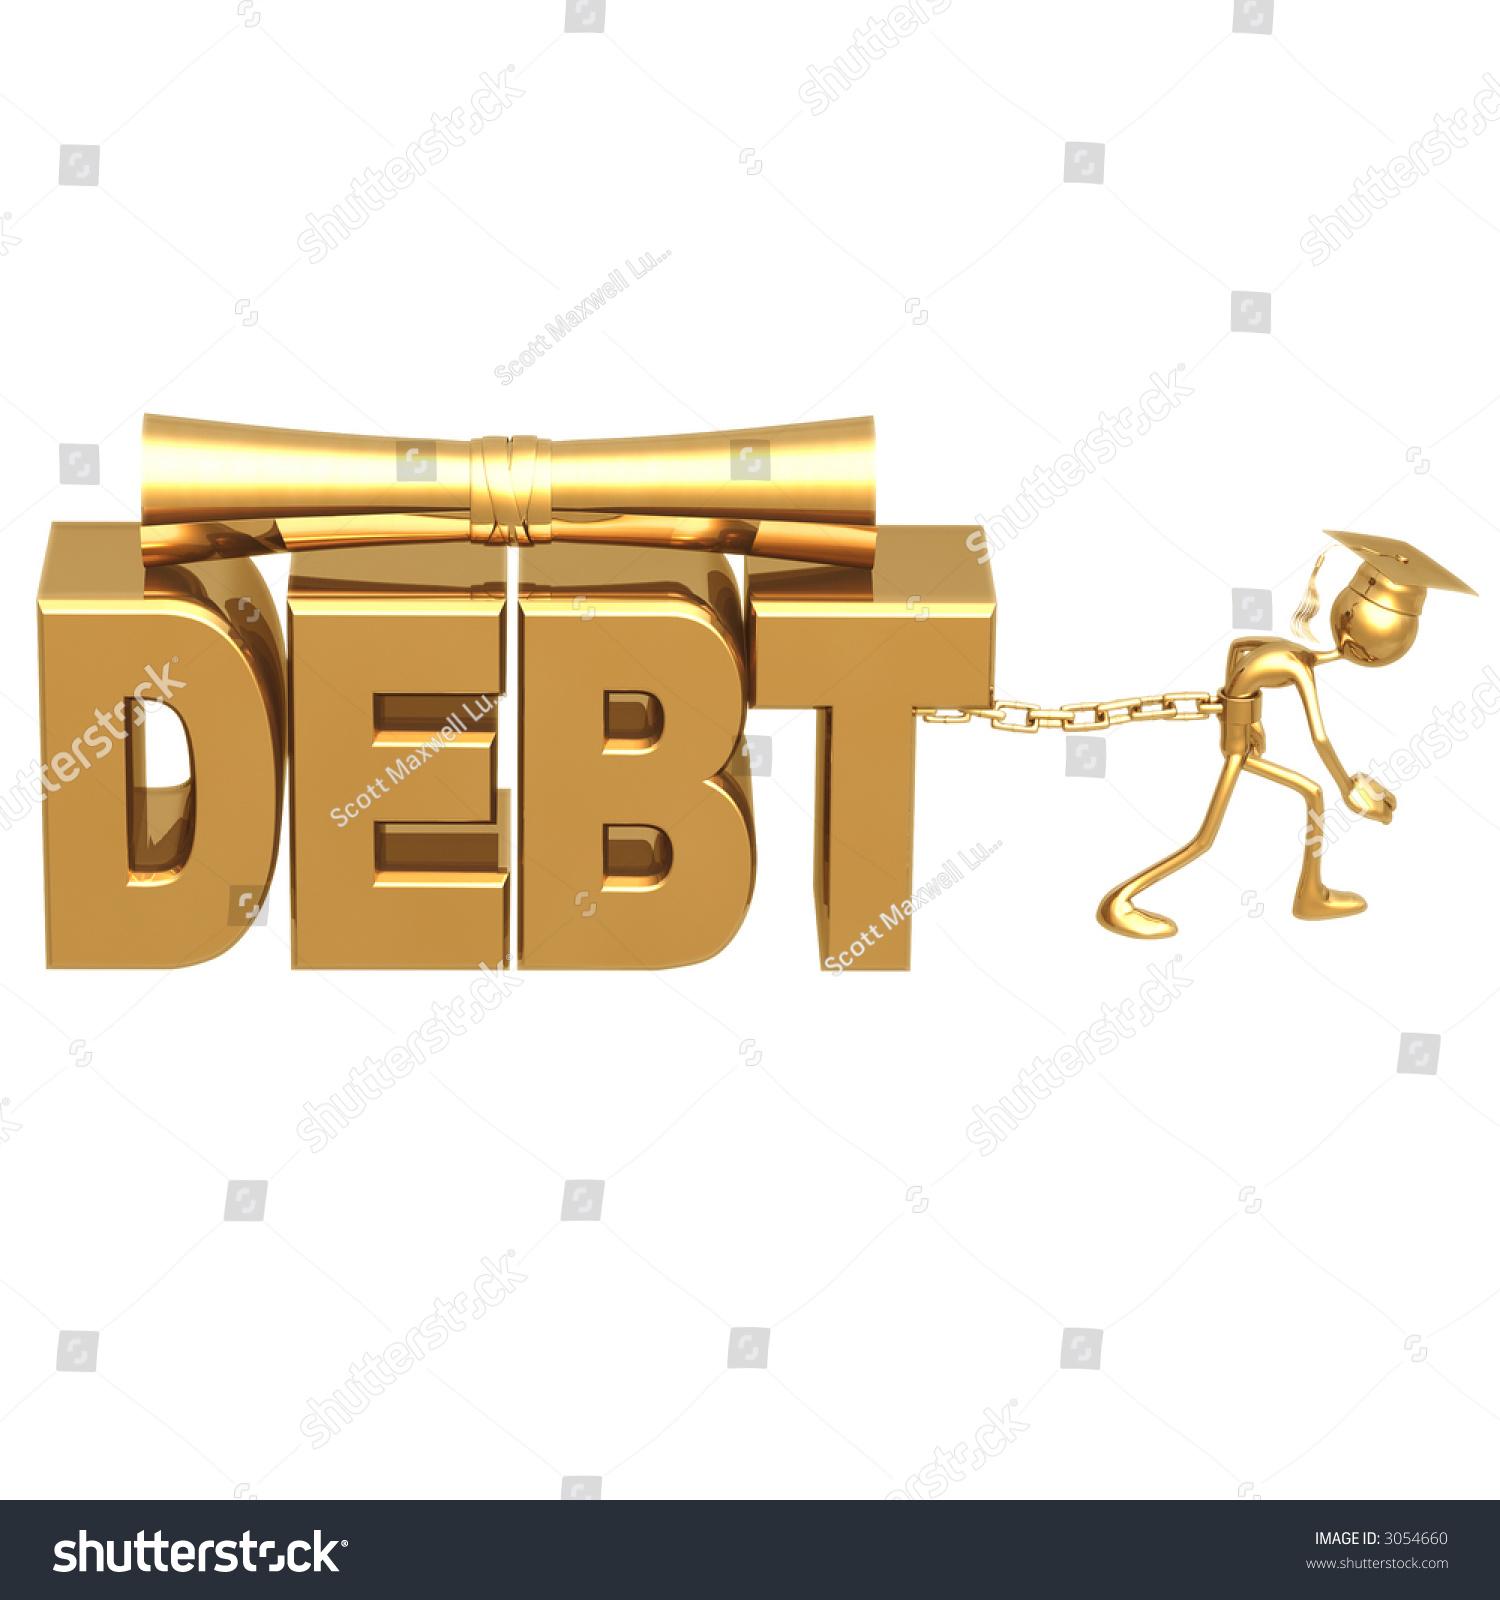 golden grad chained to education debt graduation concept stock photo 3054660 shutterstock. Black Bedroom Furniture Sets. Home Design Ideas